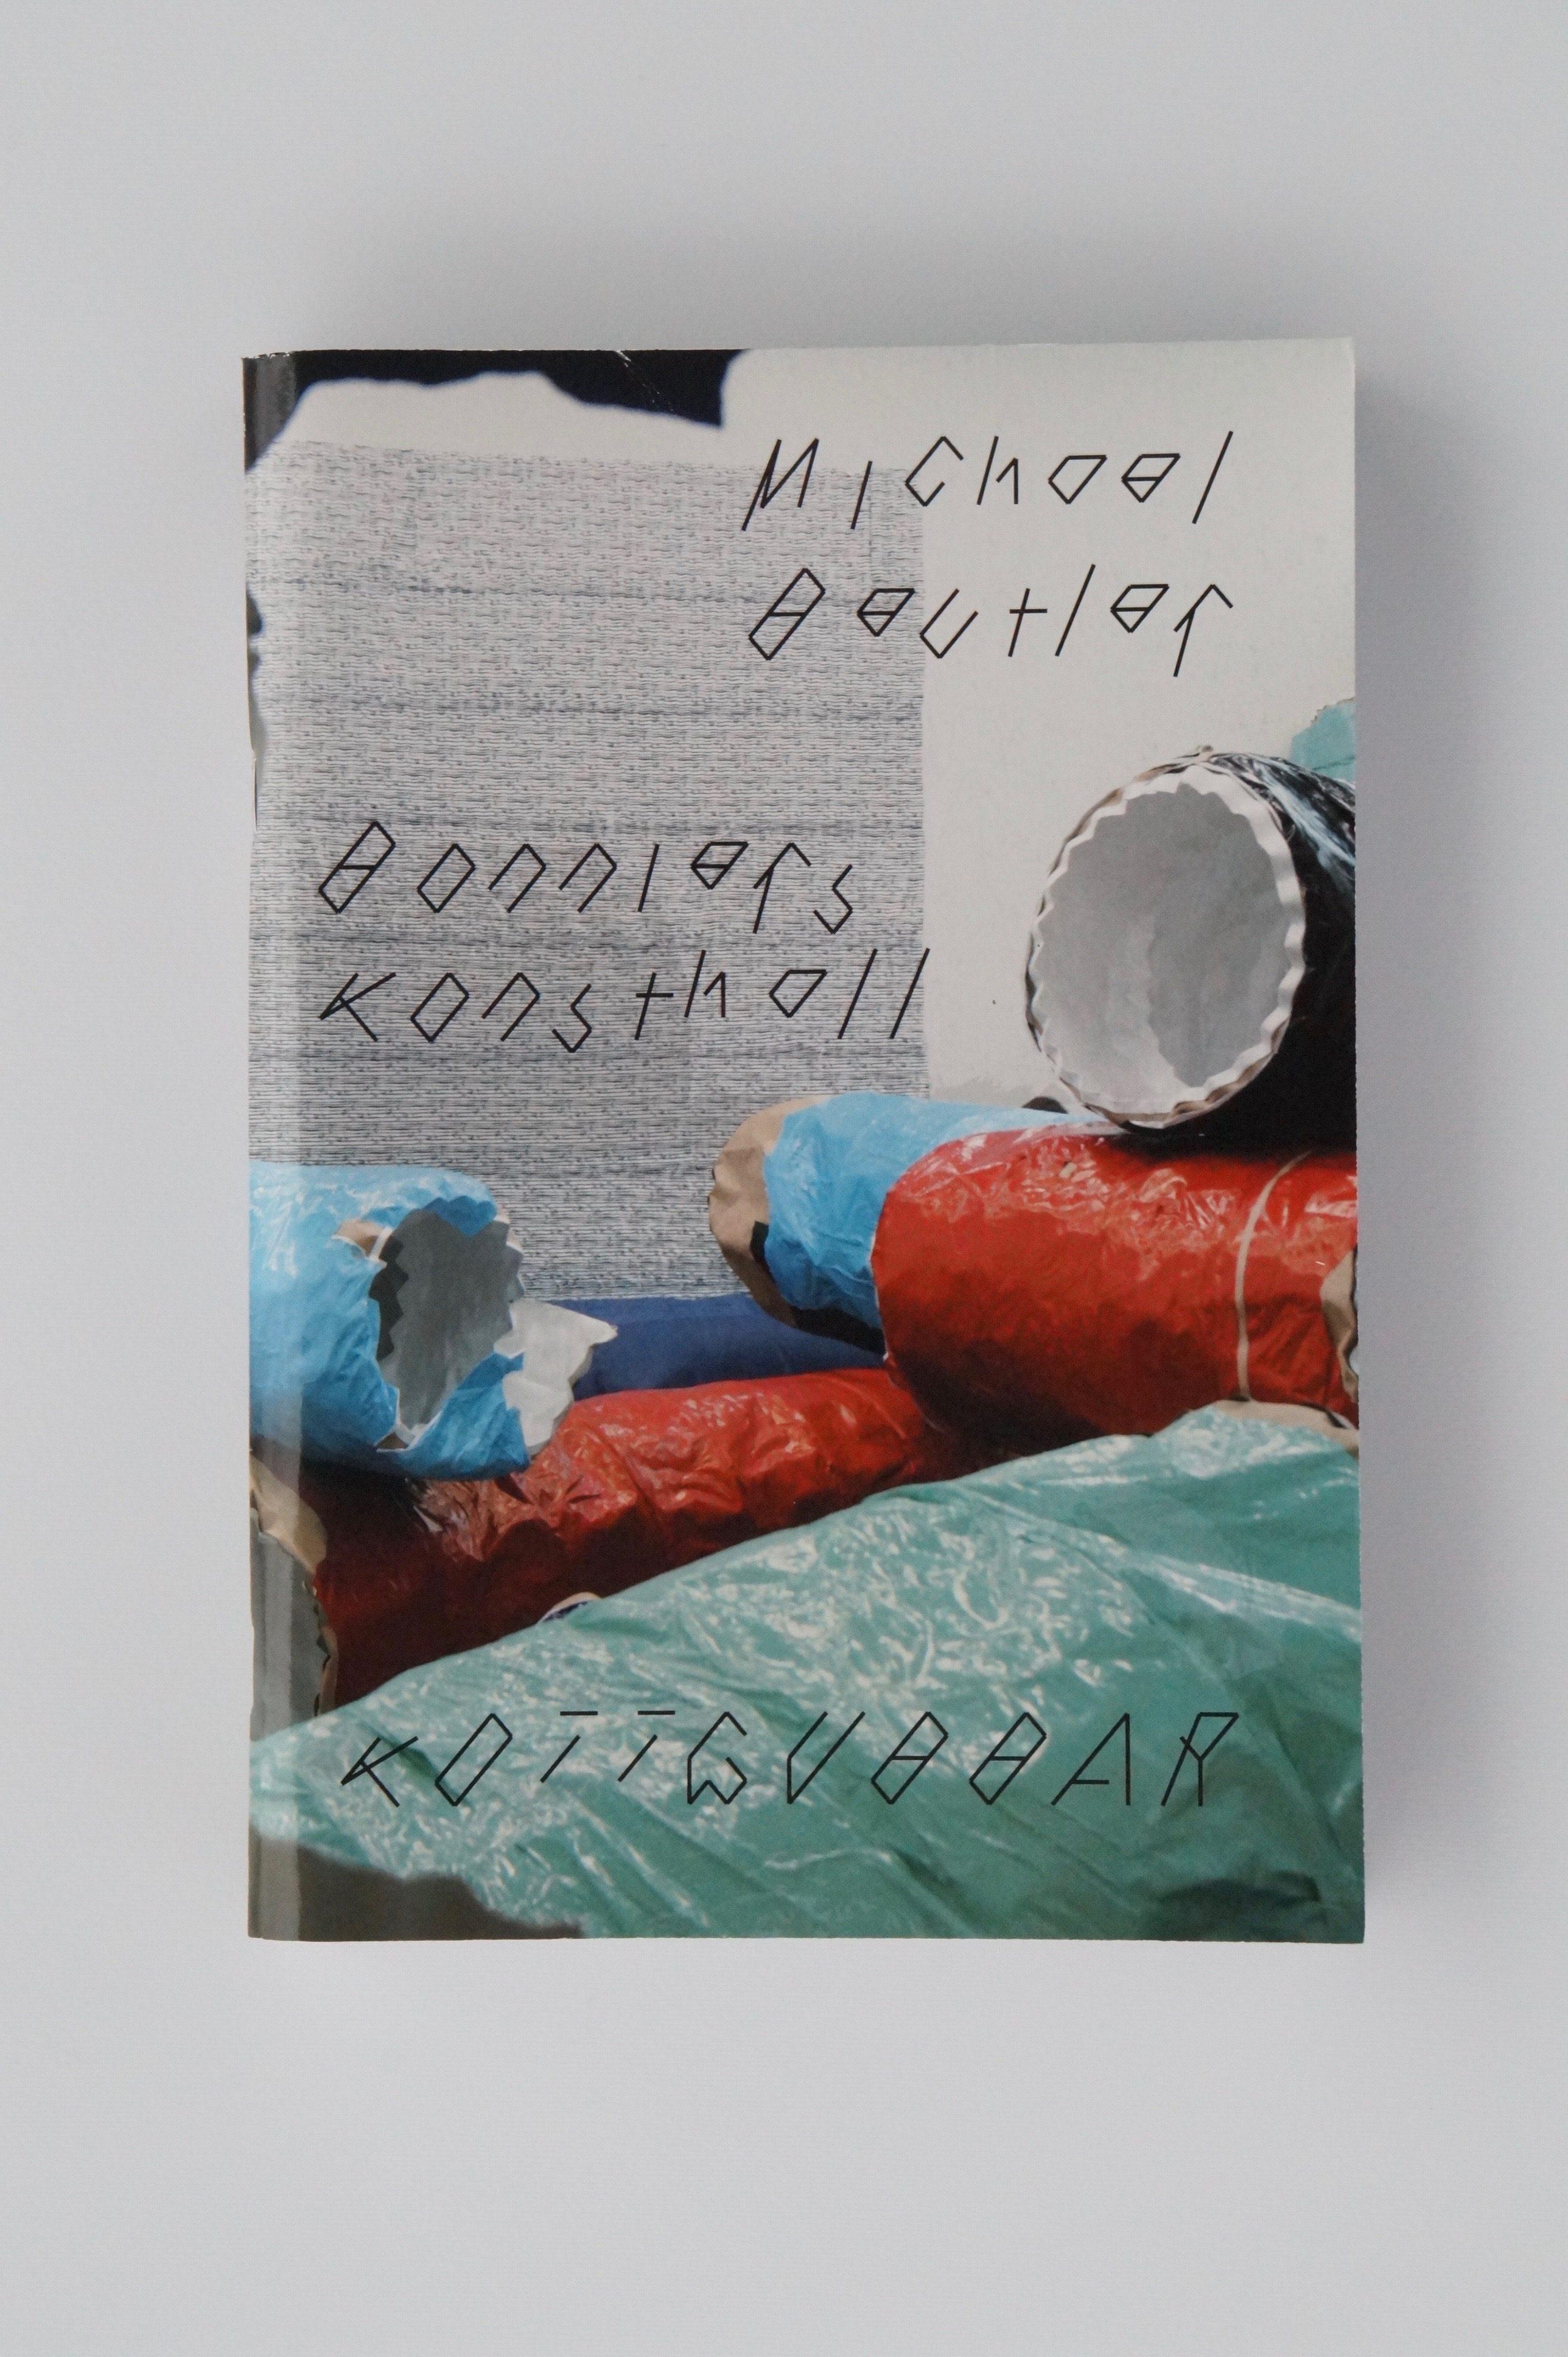 Michael Beutler Kottgubbar